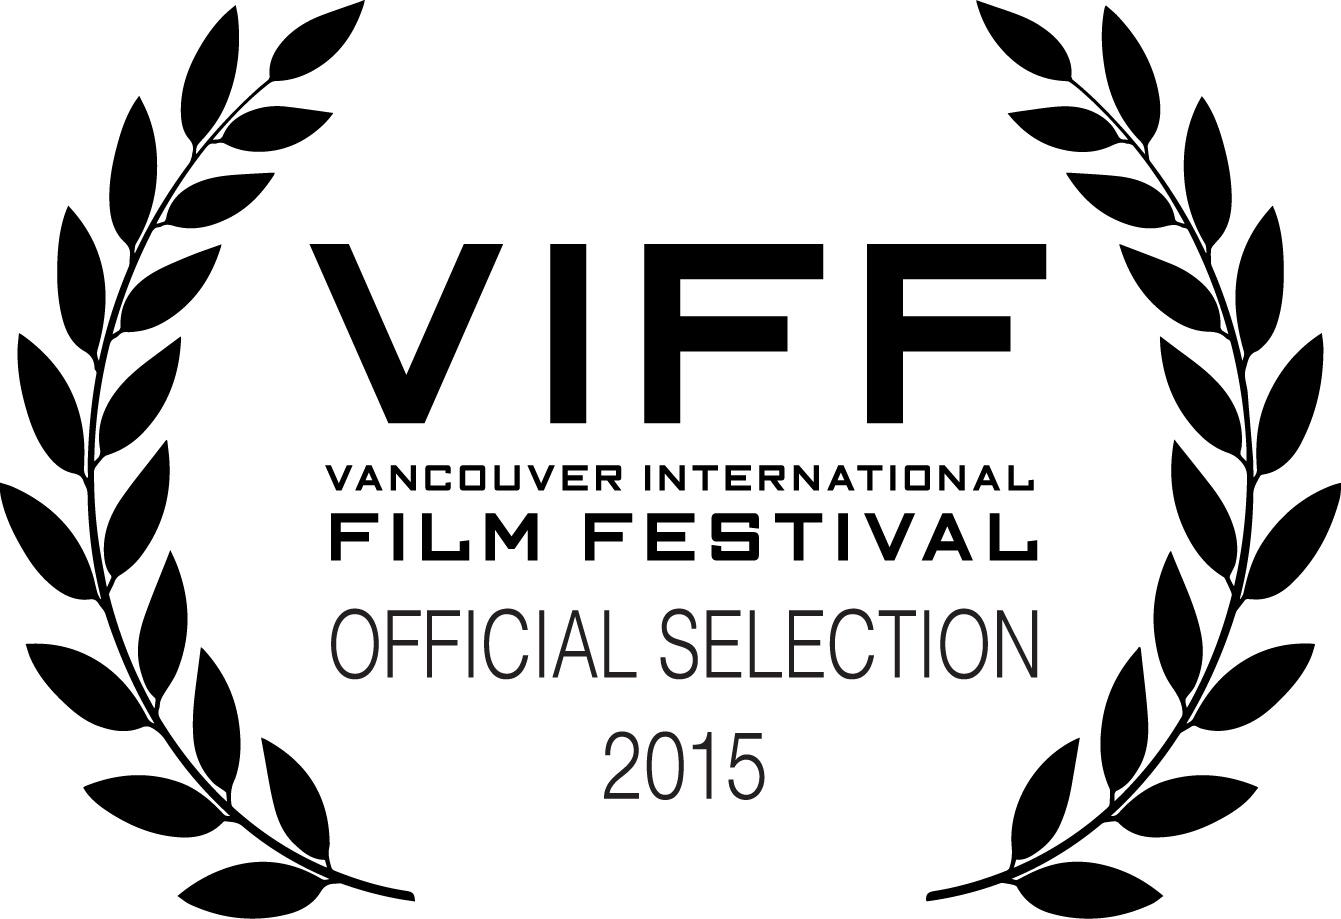 VIFF2015_OfficialSelection-black.jpg